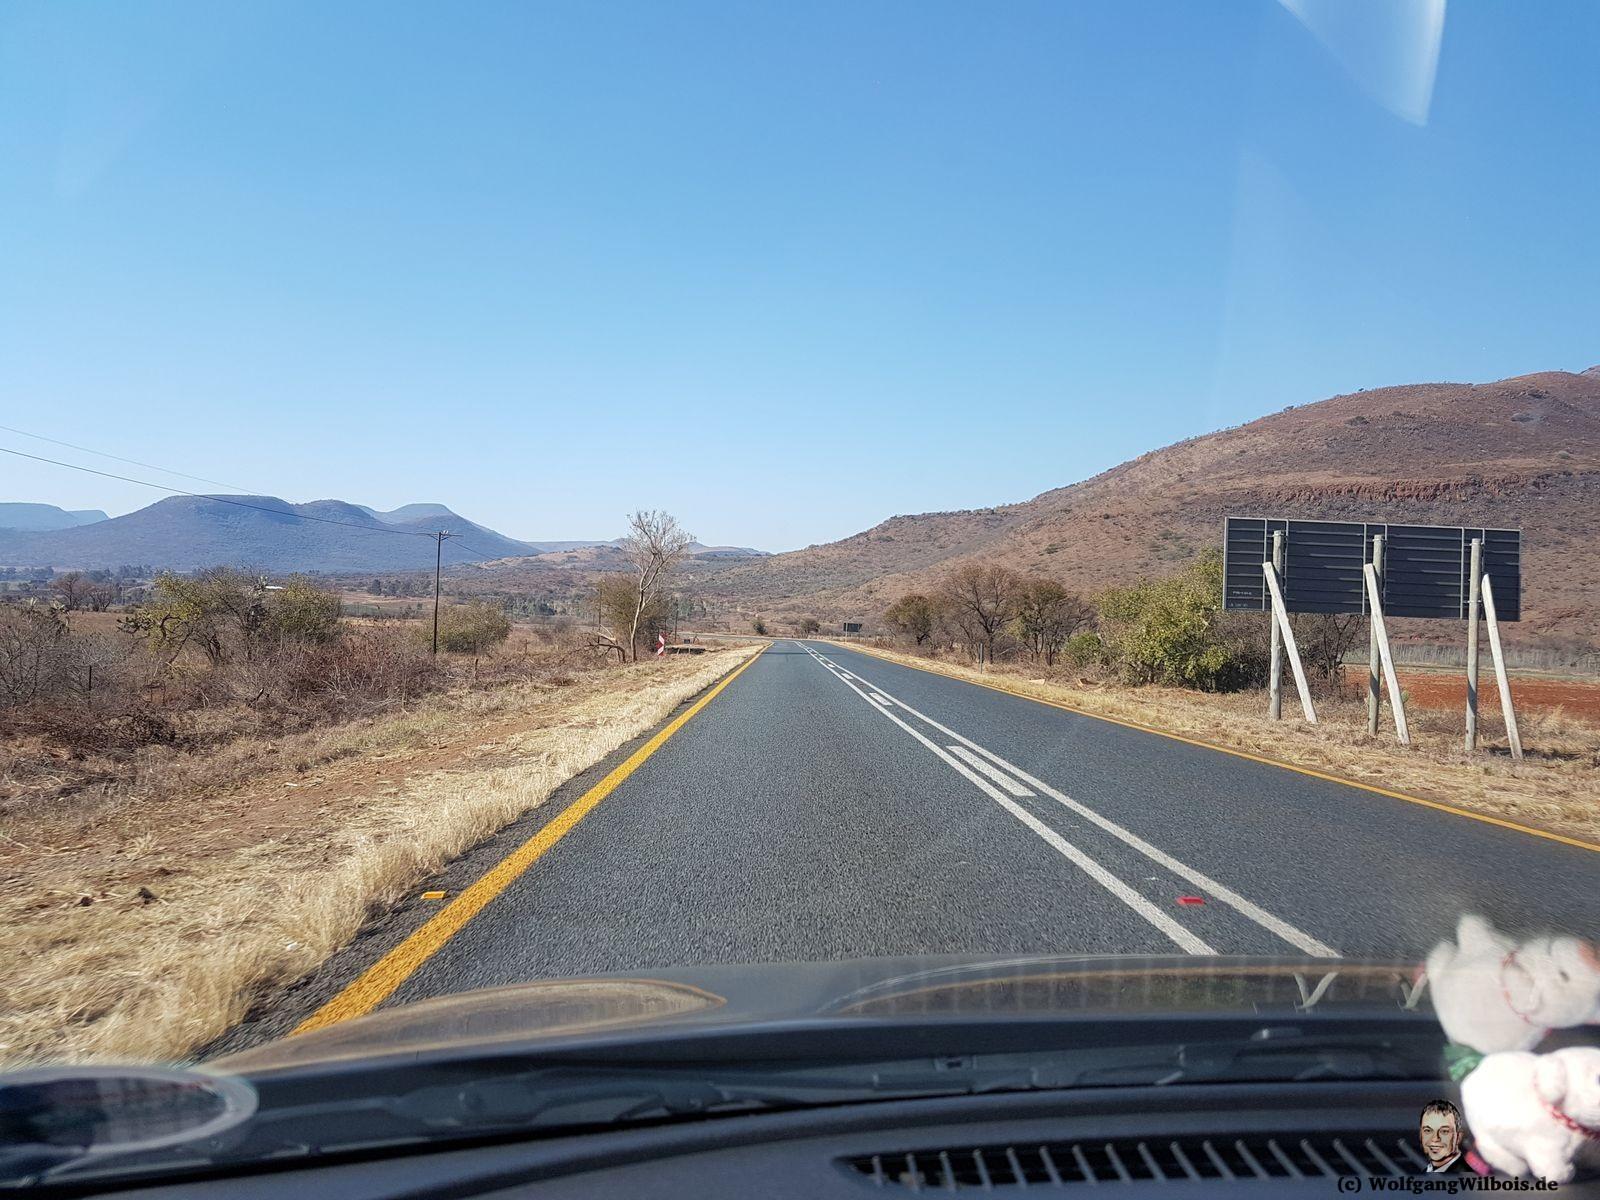 Südafrika unterwegs im Auto